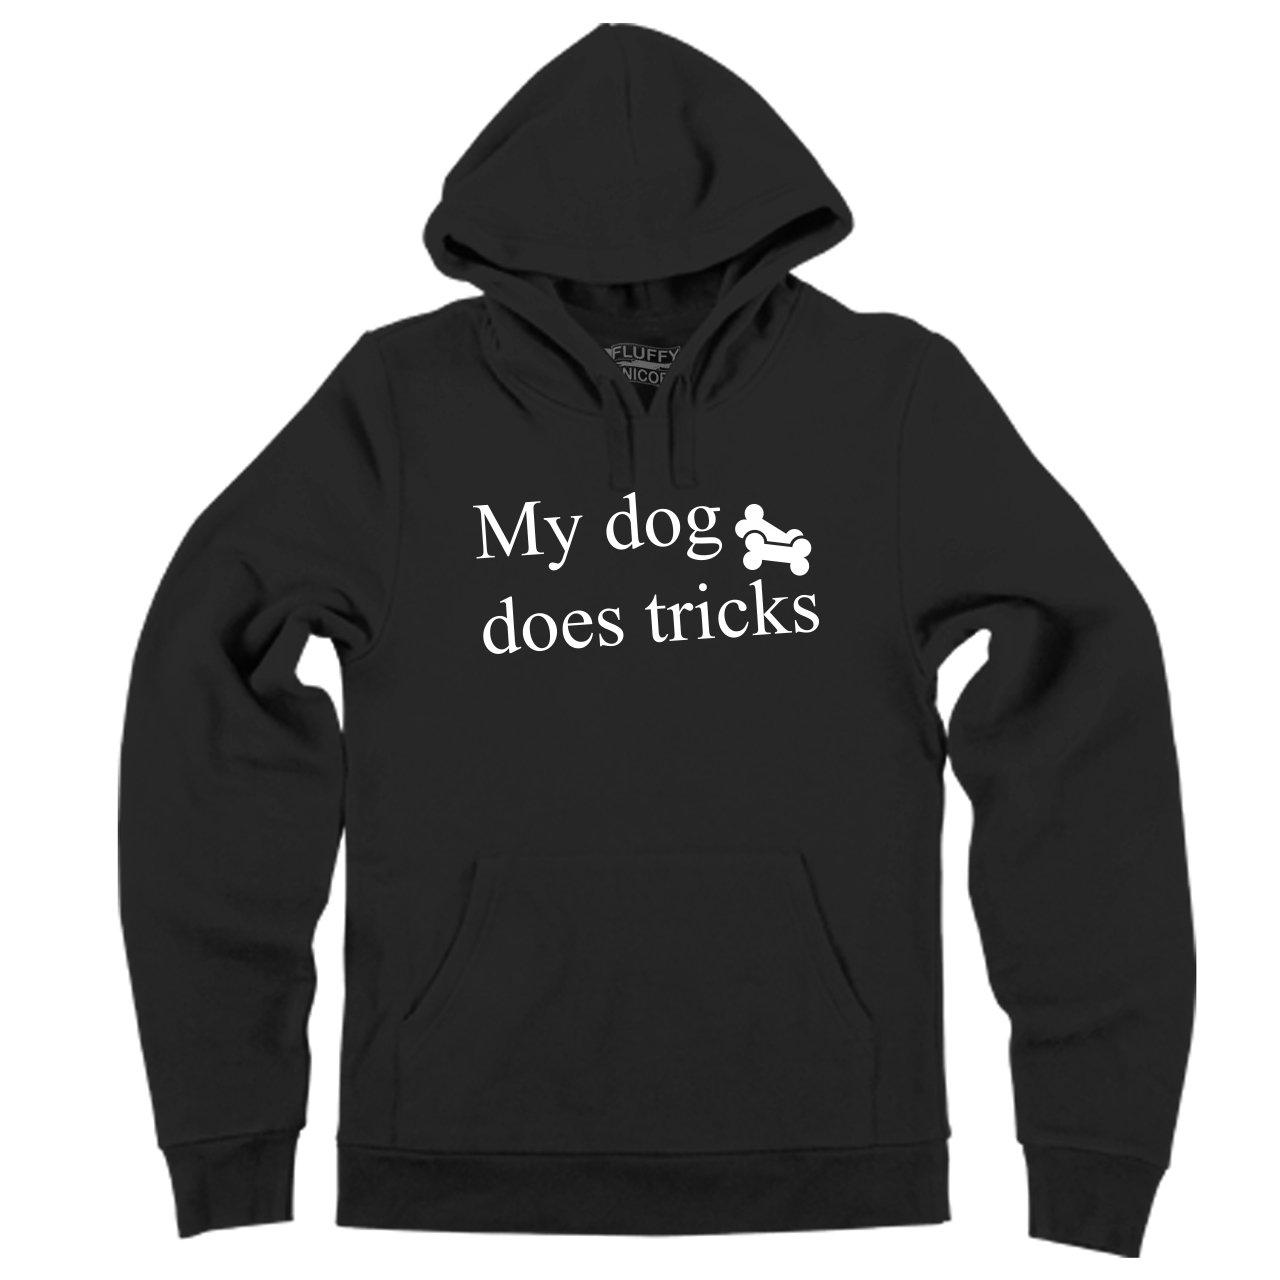 Comical Shirt Mens My Dog Does Tricks Hoodie